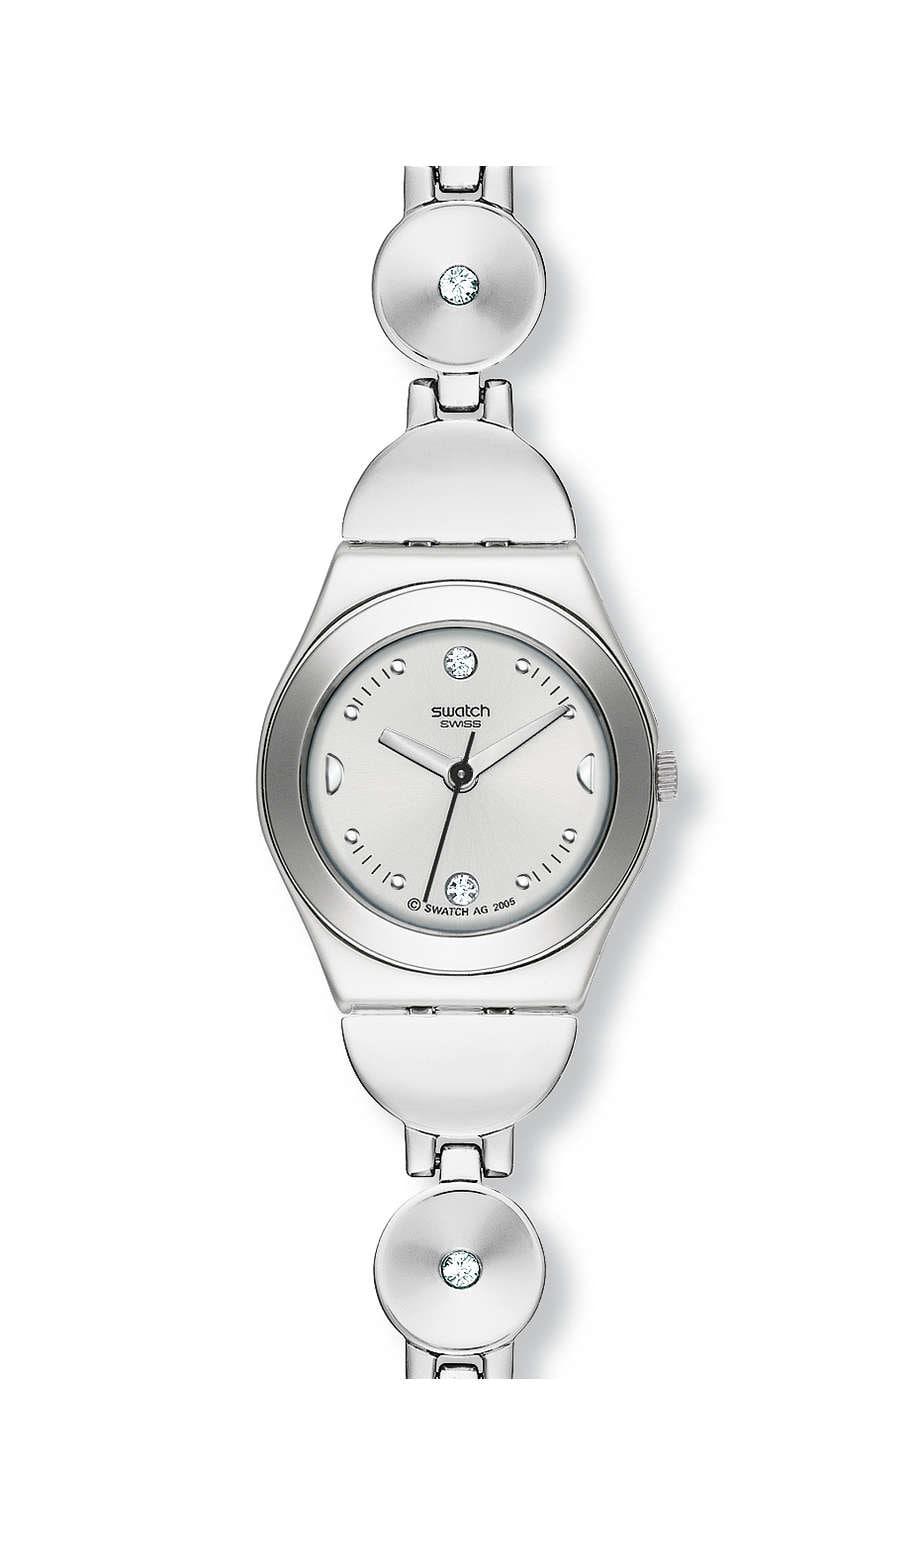 Swatch - DEEP STONES - 1